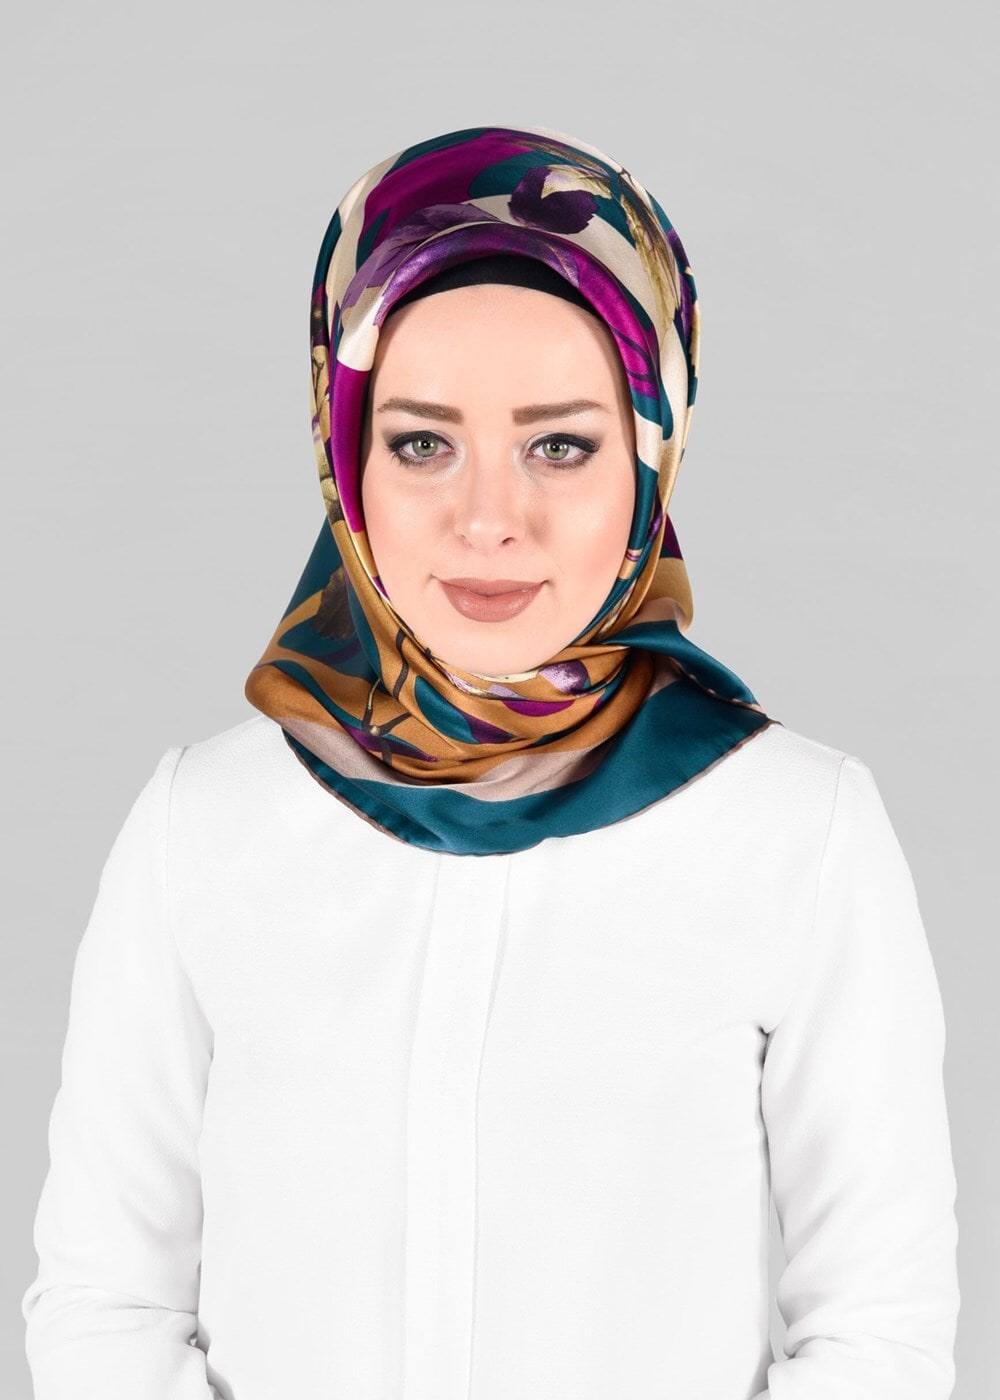 Bayan MAVİ T 13288-1 ALVİNA İPEK EŞARP